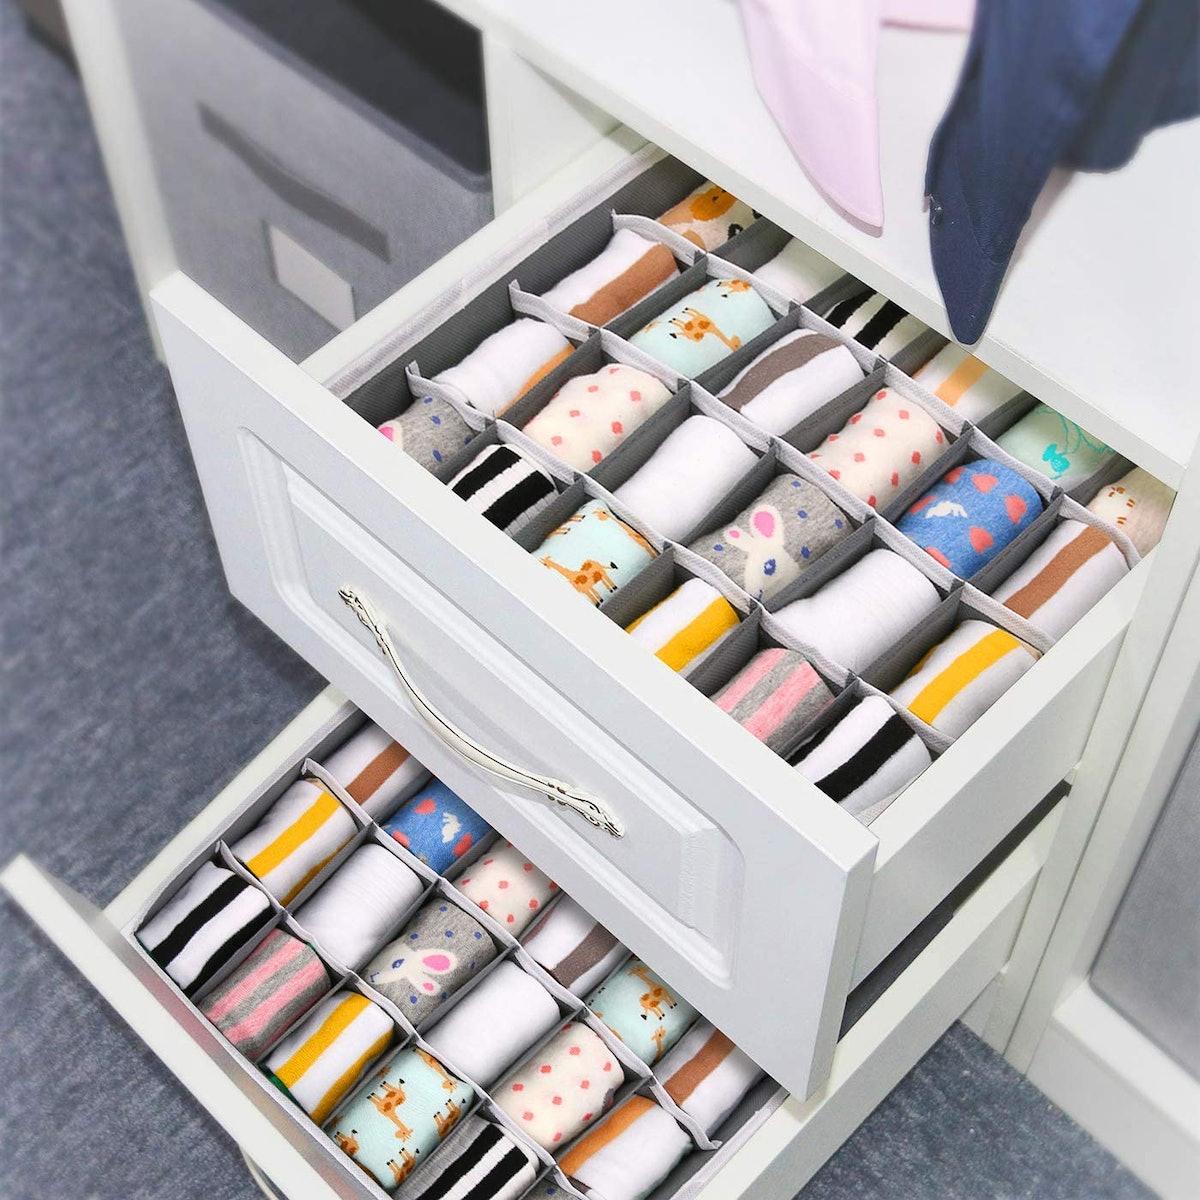 Joyoldelf Sock Drawer Organizer (2-Pack)